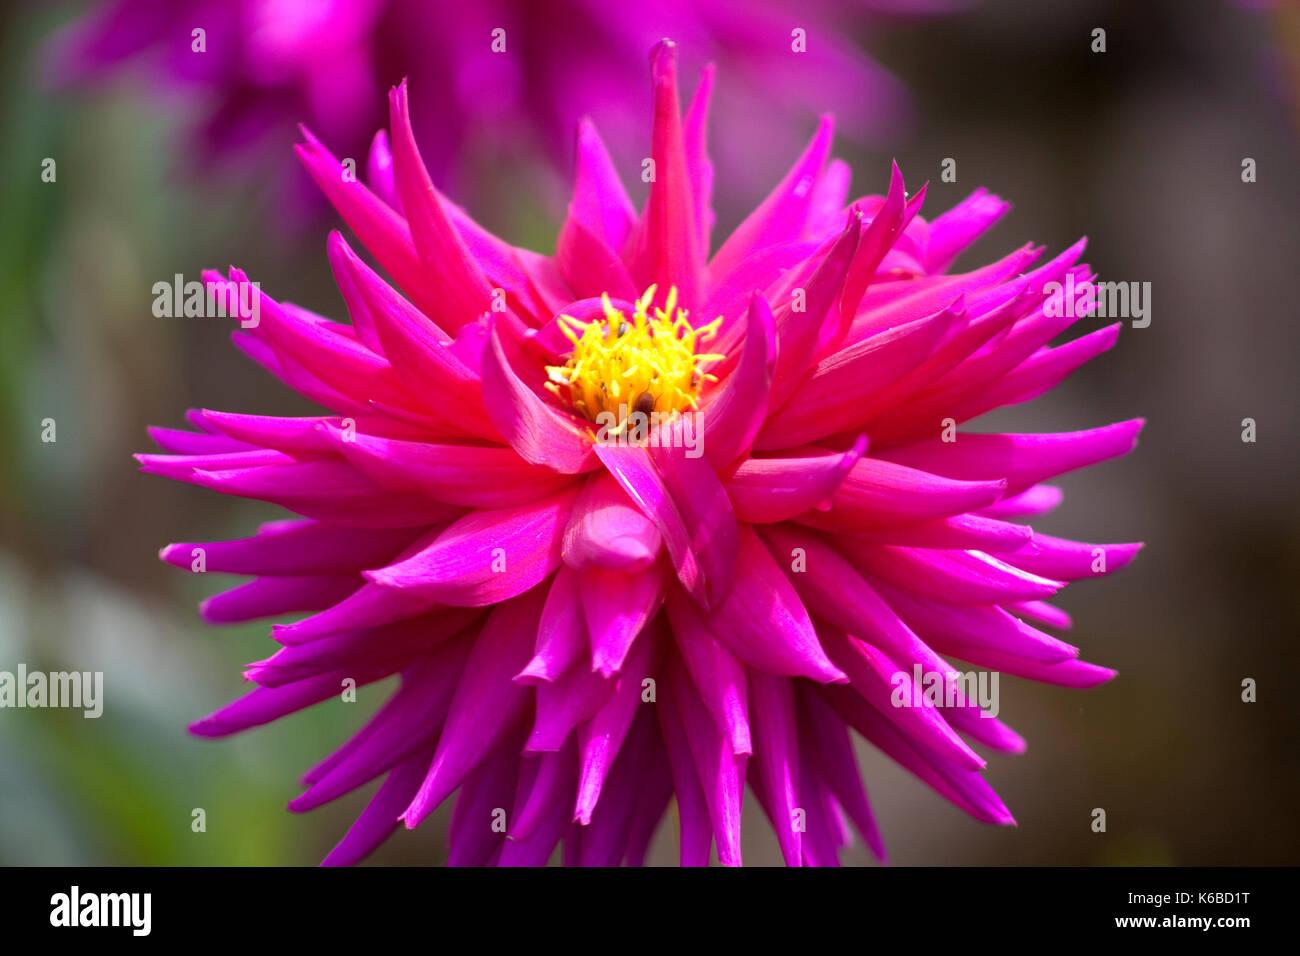 Dahlia Pink - Stock Image